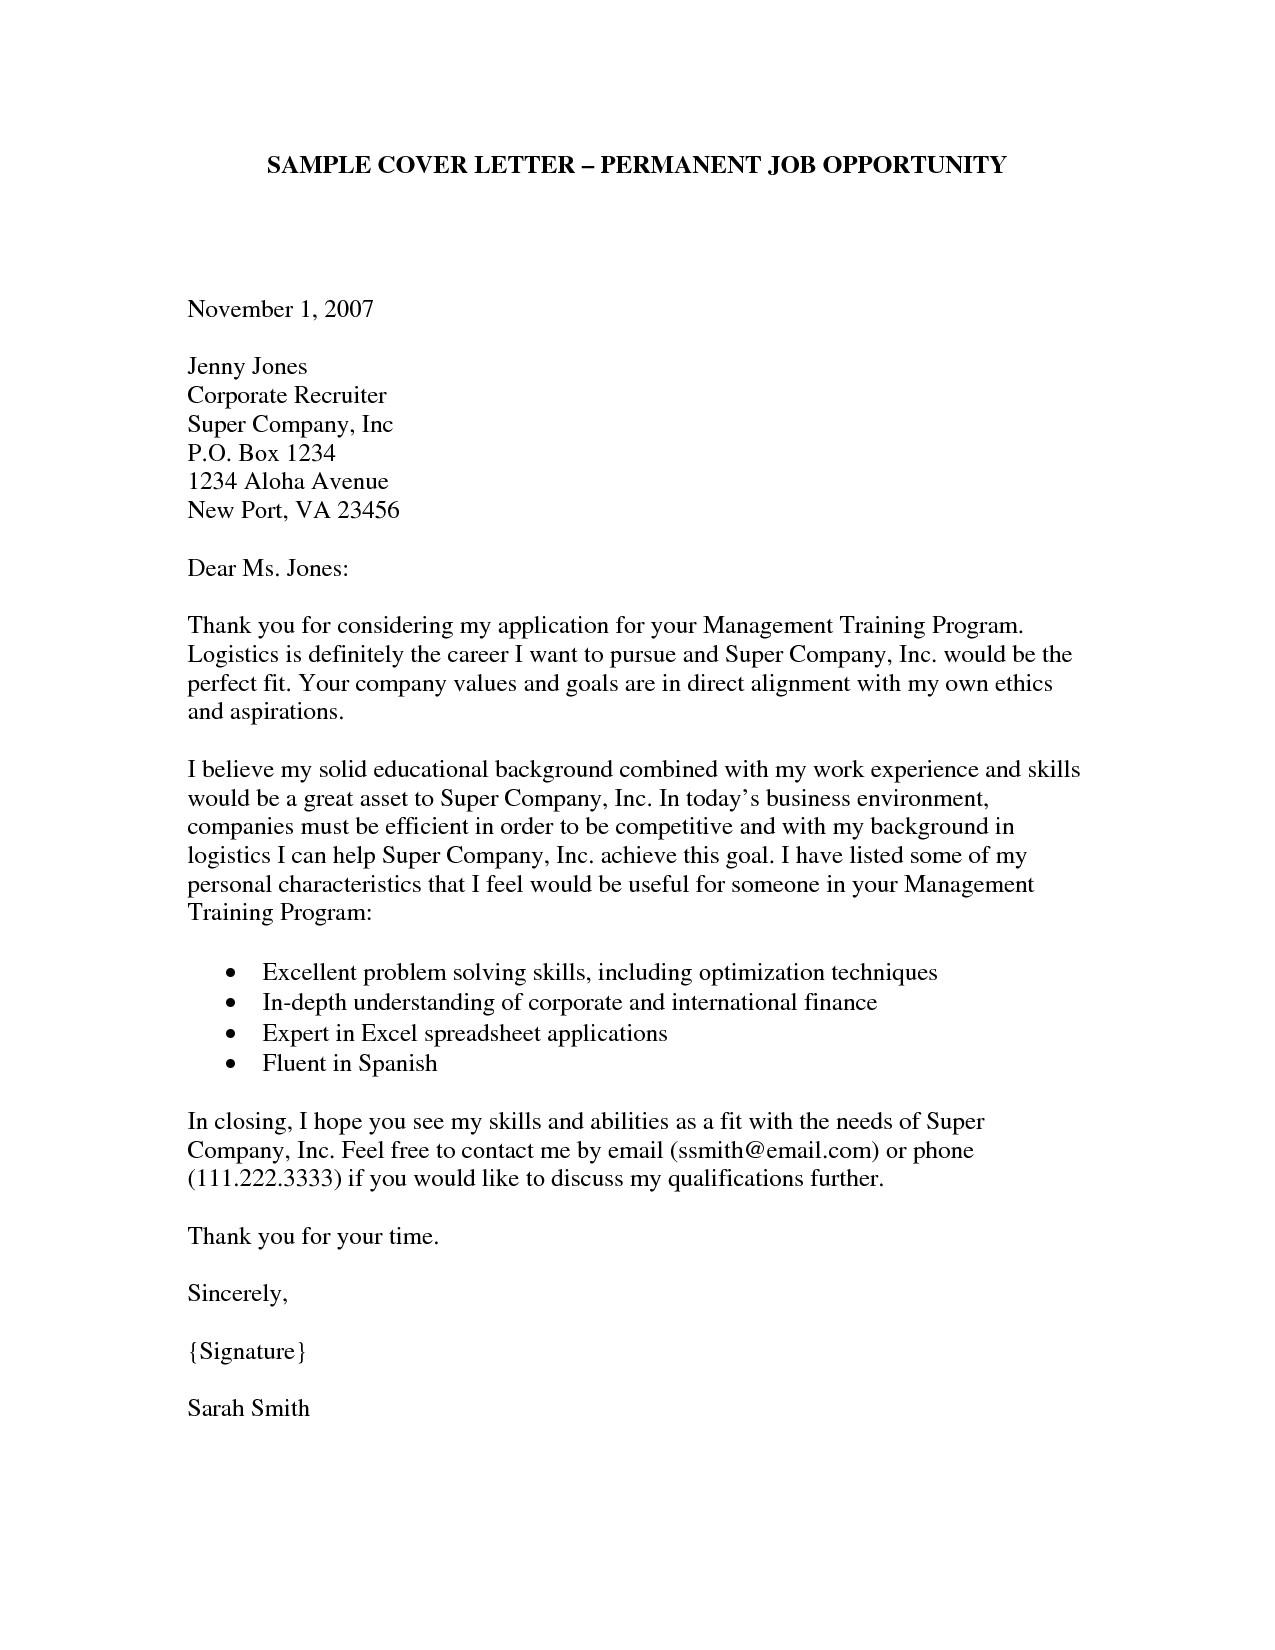 Cover Letter for Employment Opportunity Comfortable Sample Cover Letter for Cv for Nurses Ideas Entry